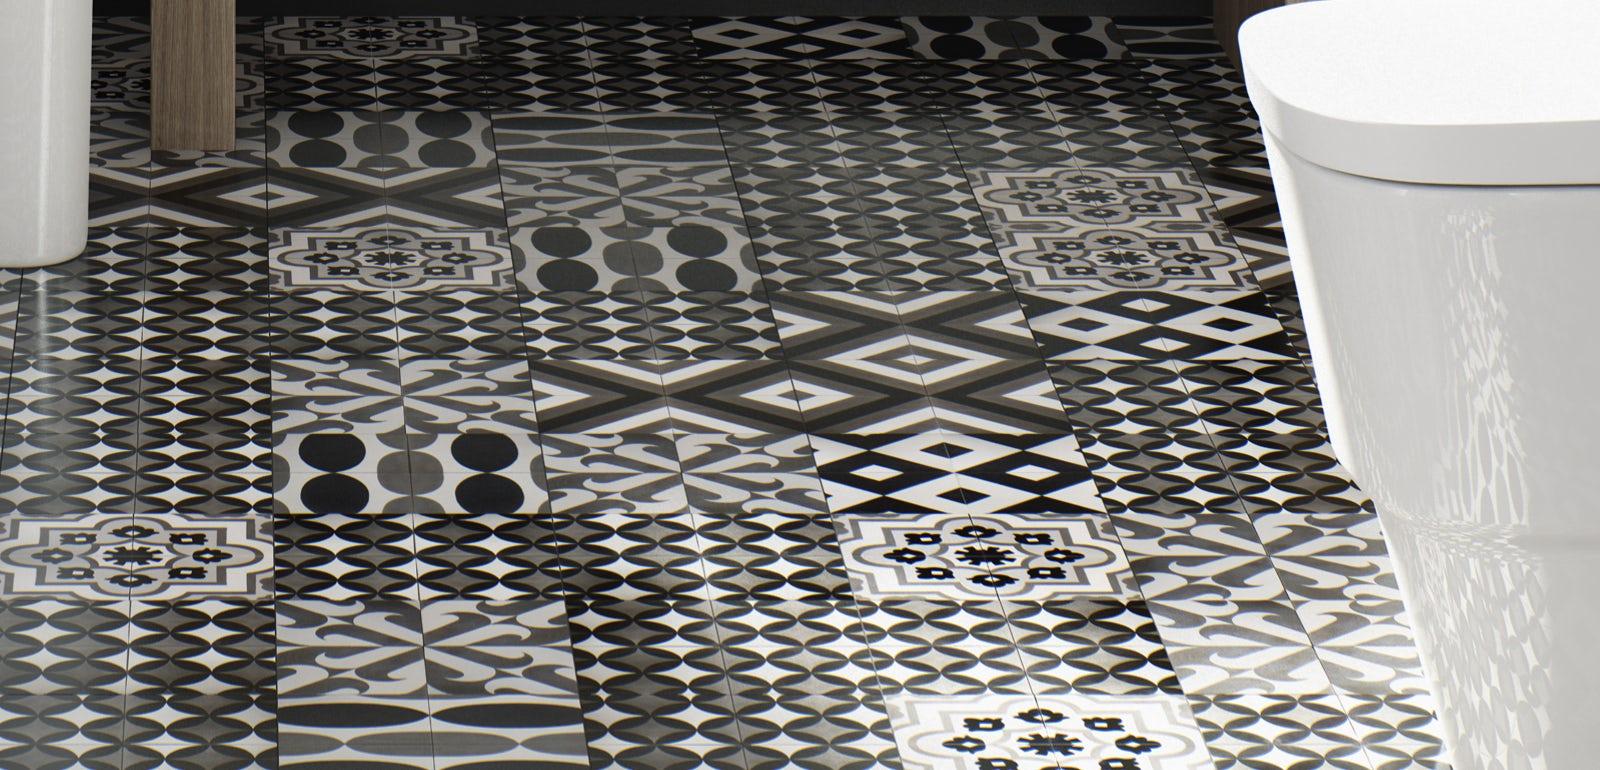 Exellent Art Deco Bathroom Tiles Uk And Inspiration Decorating